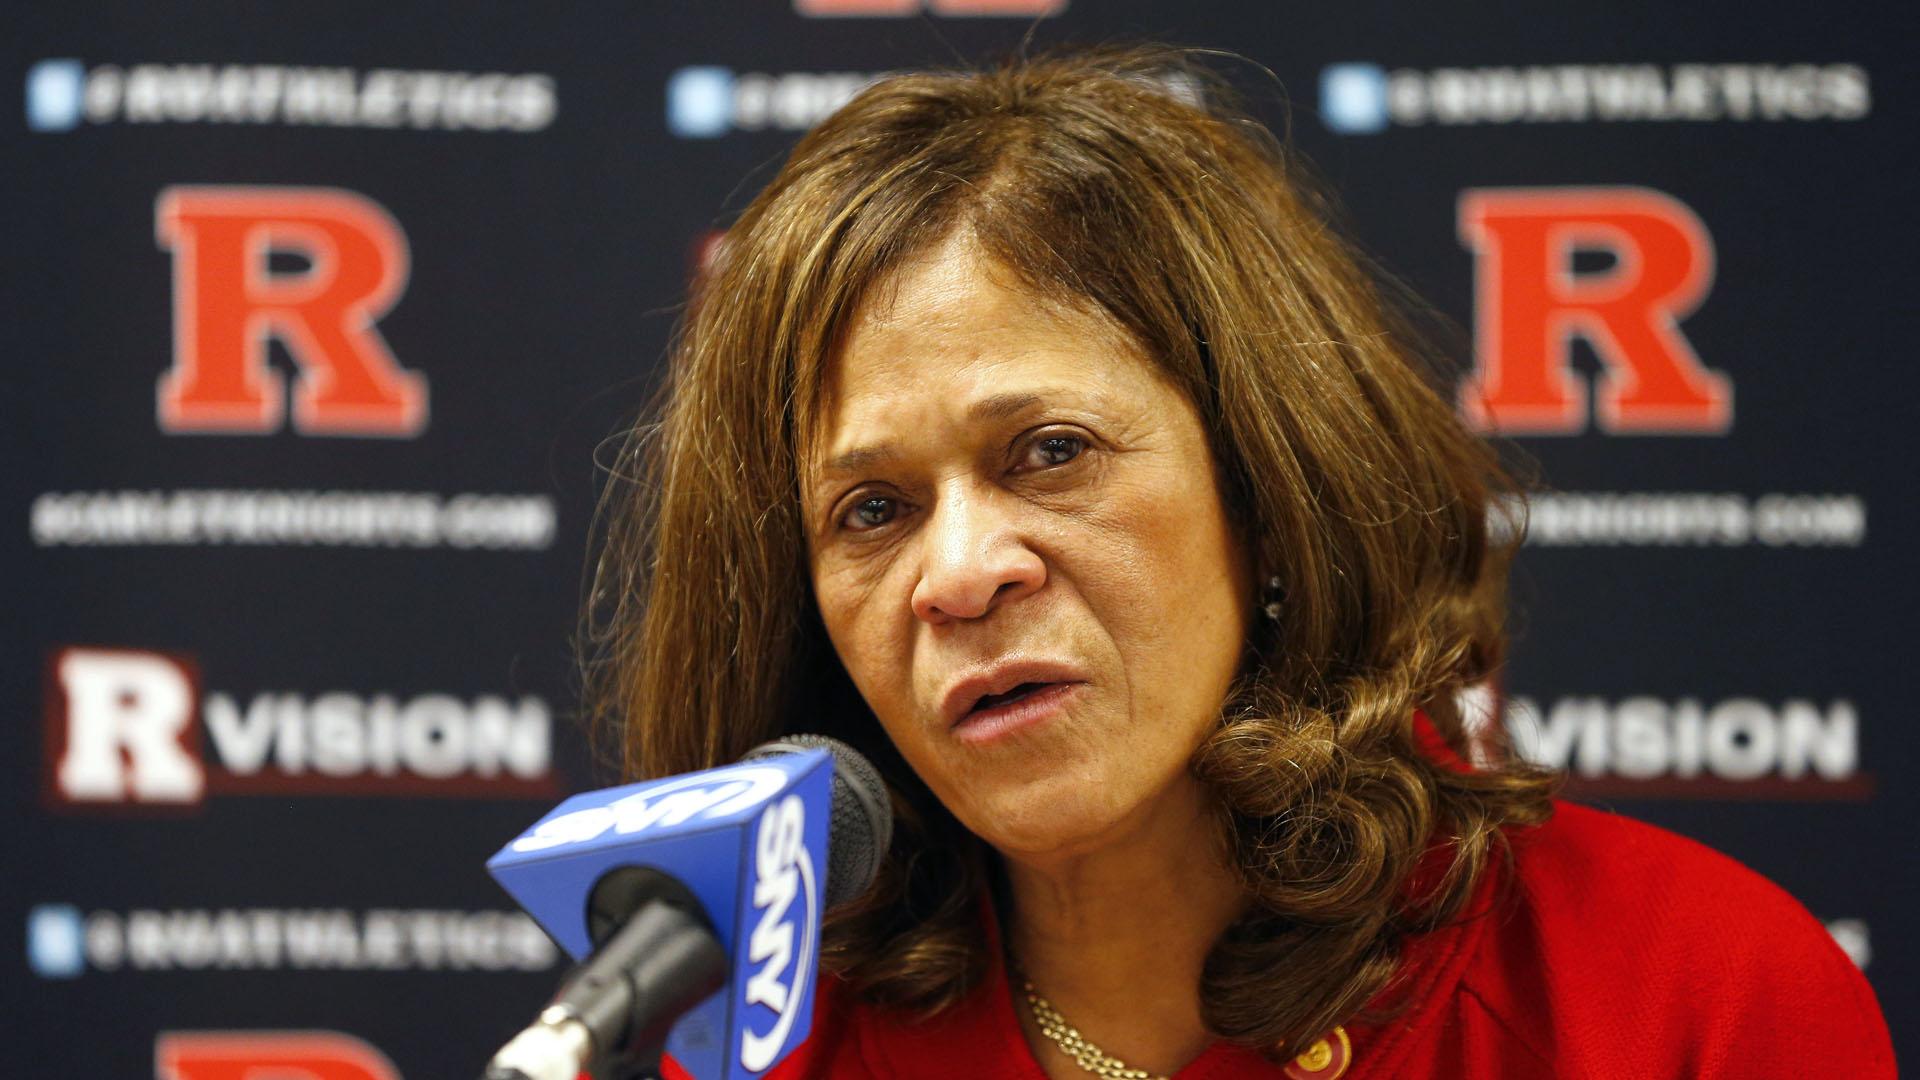 Rutgers C Vivian Stringer Wins 1000th Game Sporting News